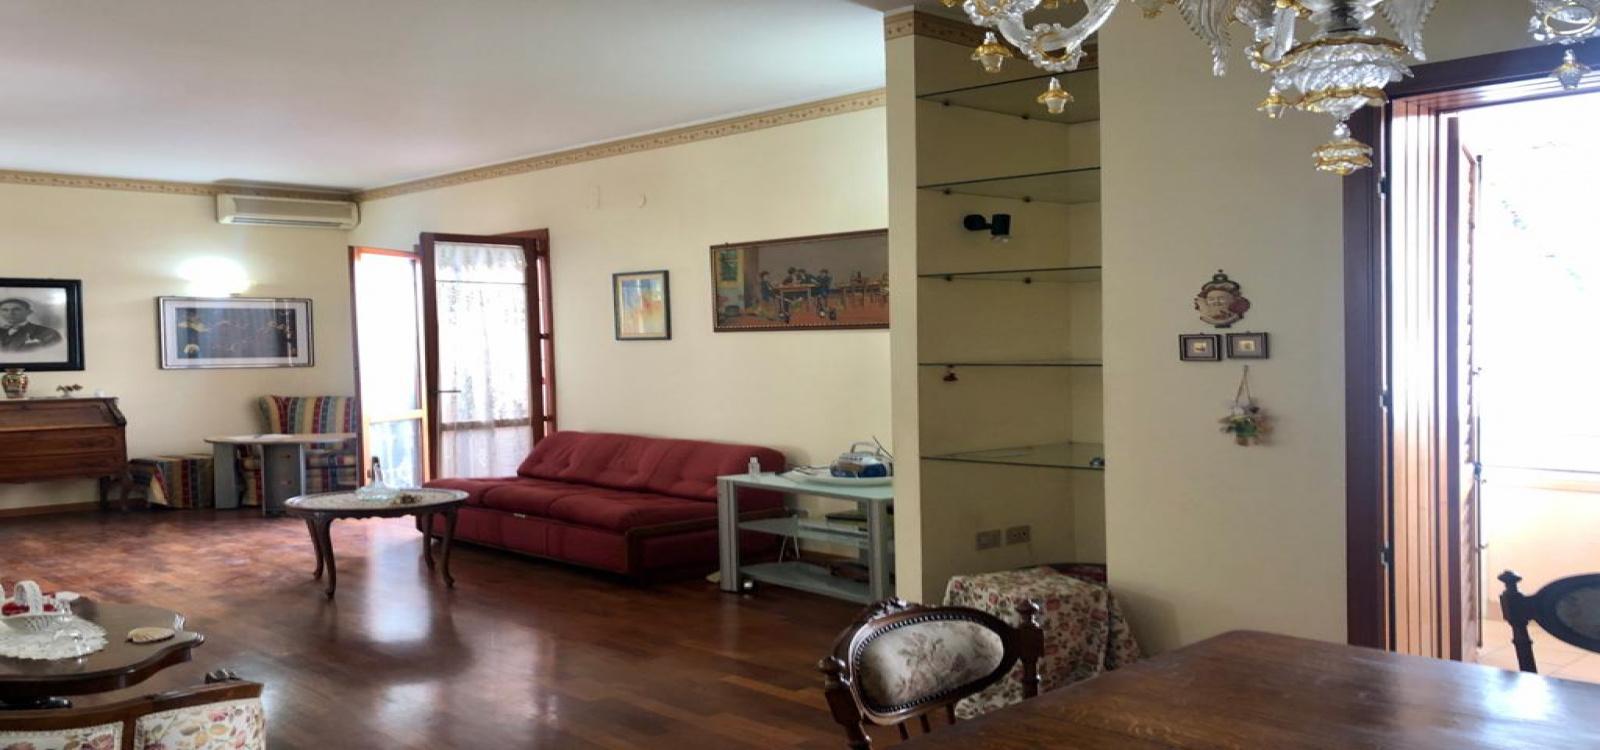 VIALE EPIPOLI,SIRACUSA,96100,Appartamento,VIALE EPIPOLI ,2432